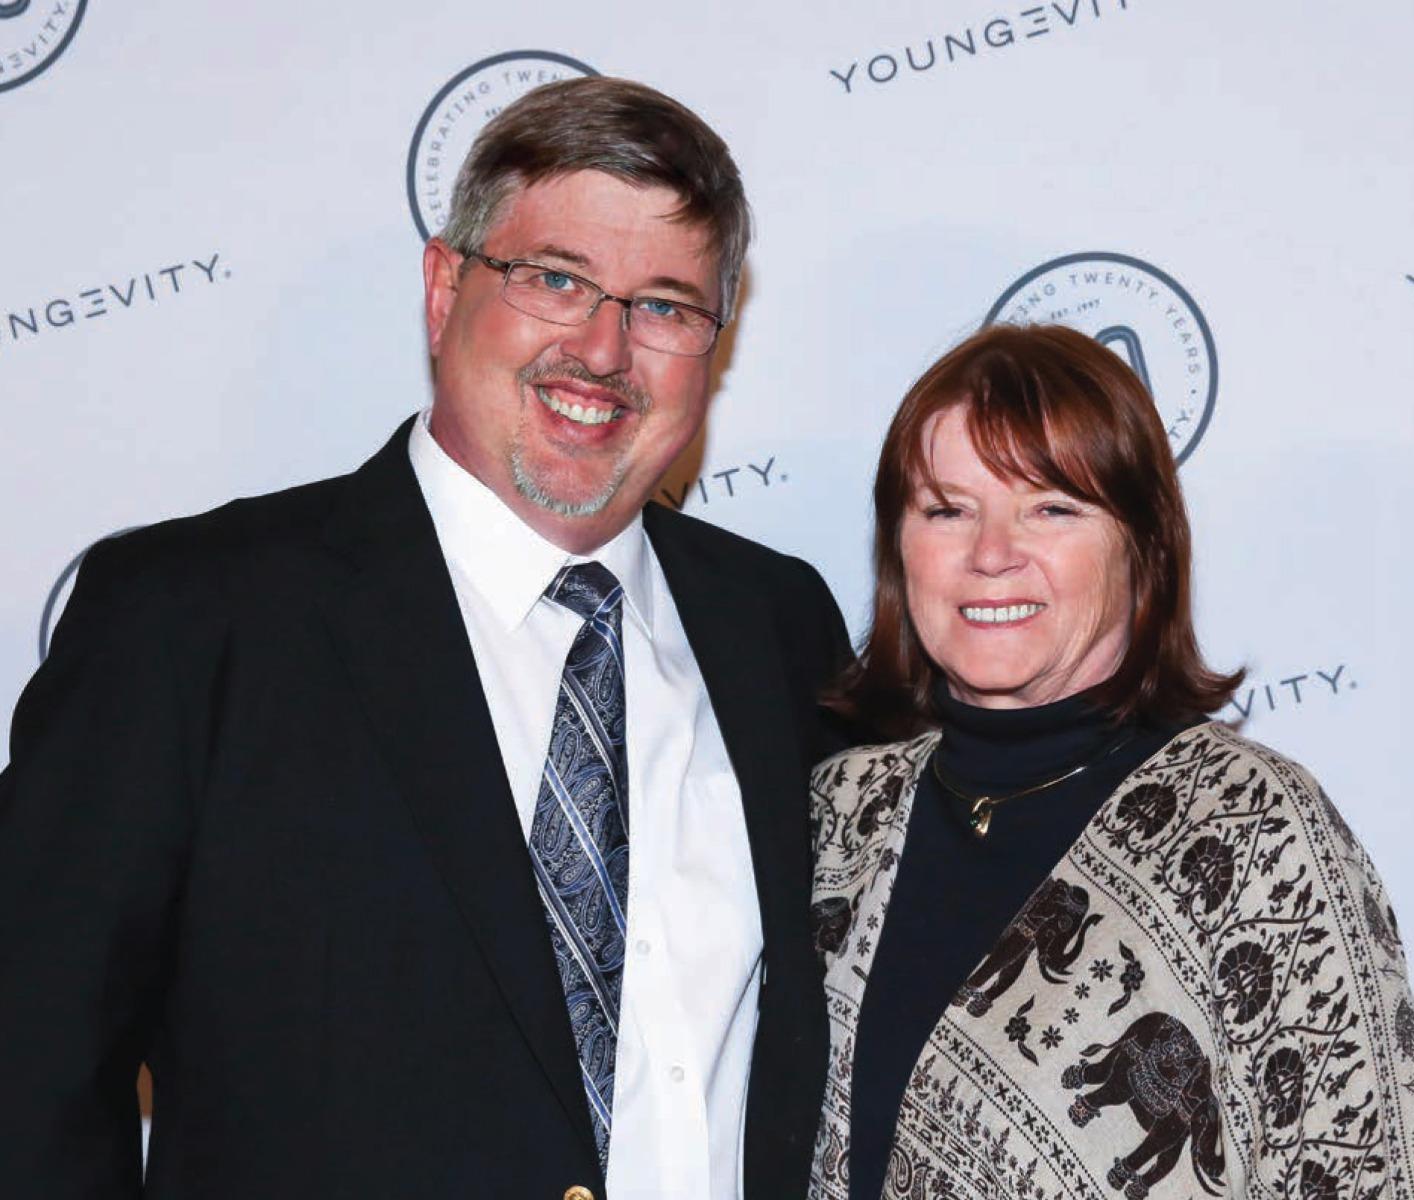 Richard and Roxanne Renton